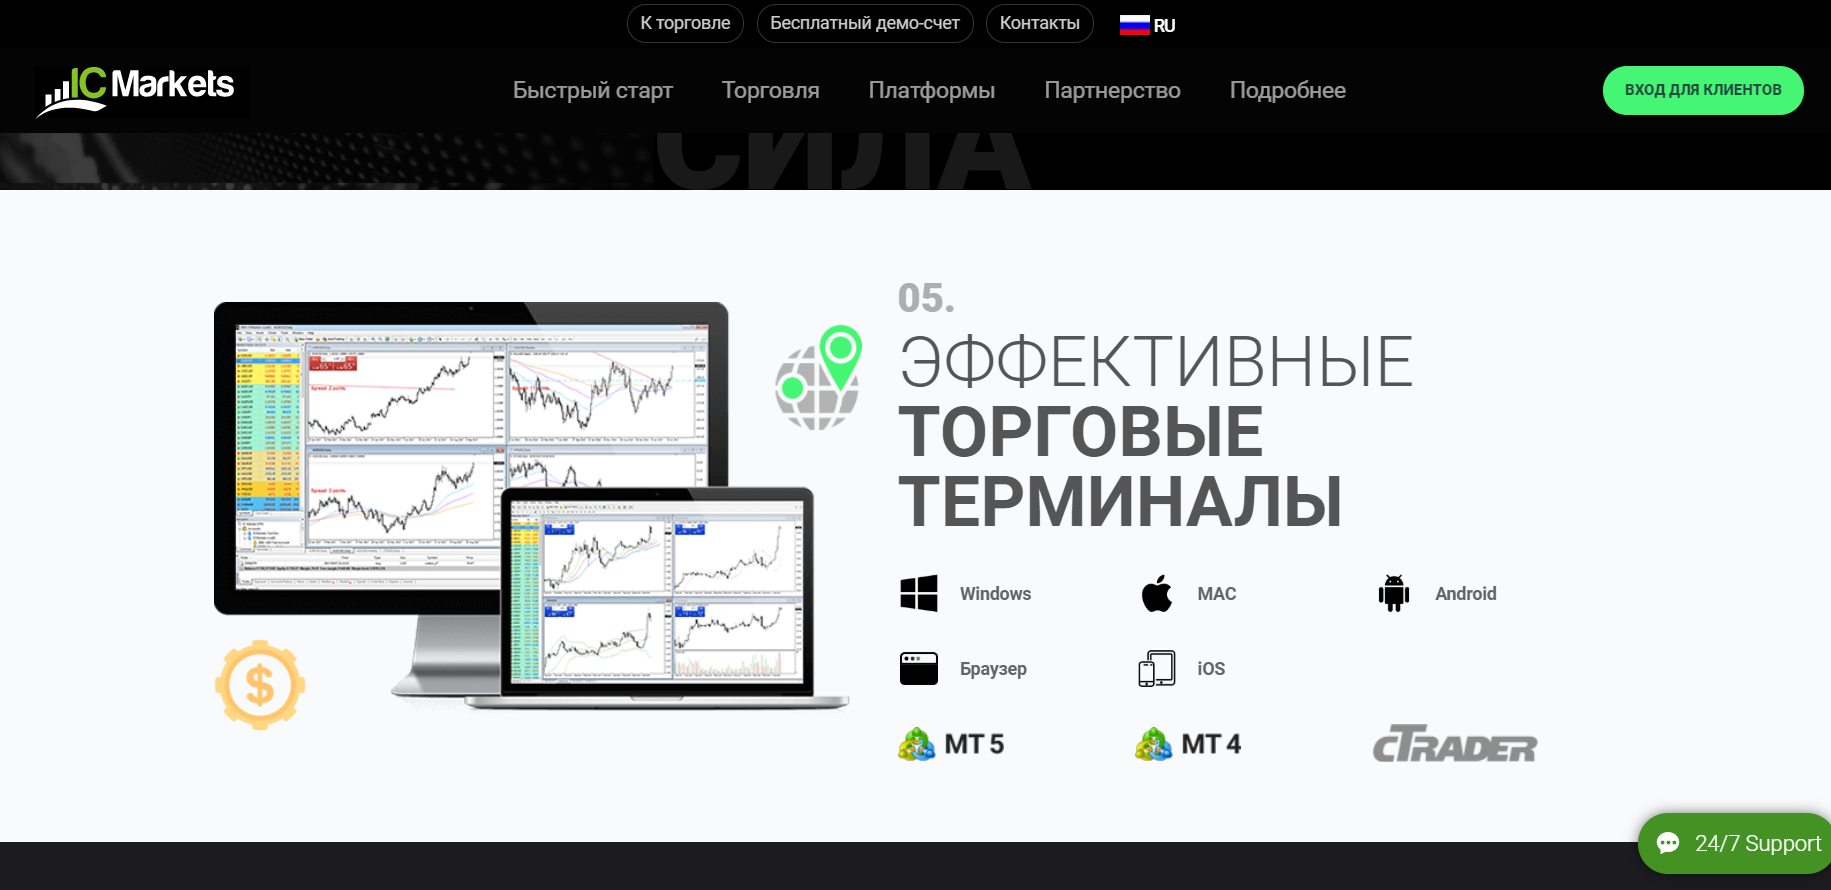 телминал для торговли у IC Markets